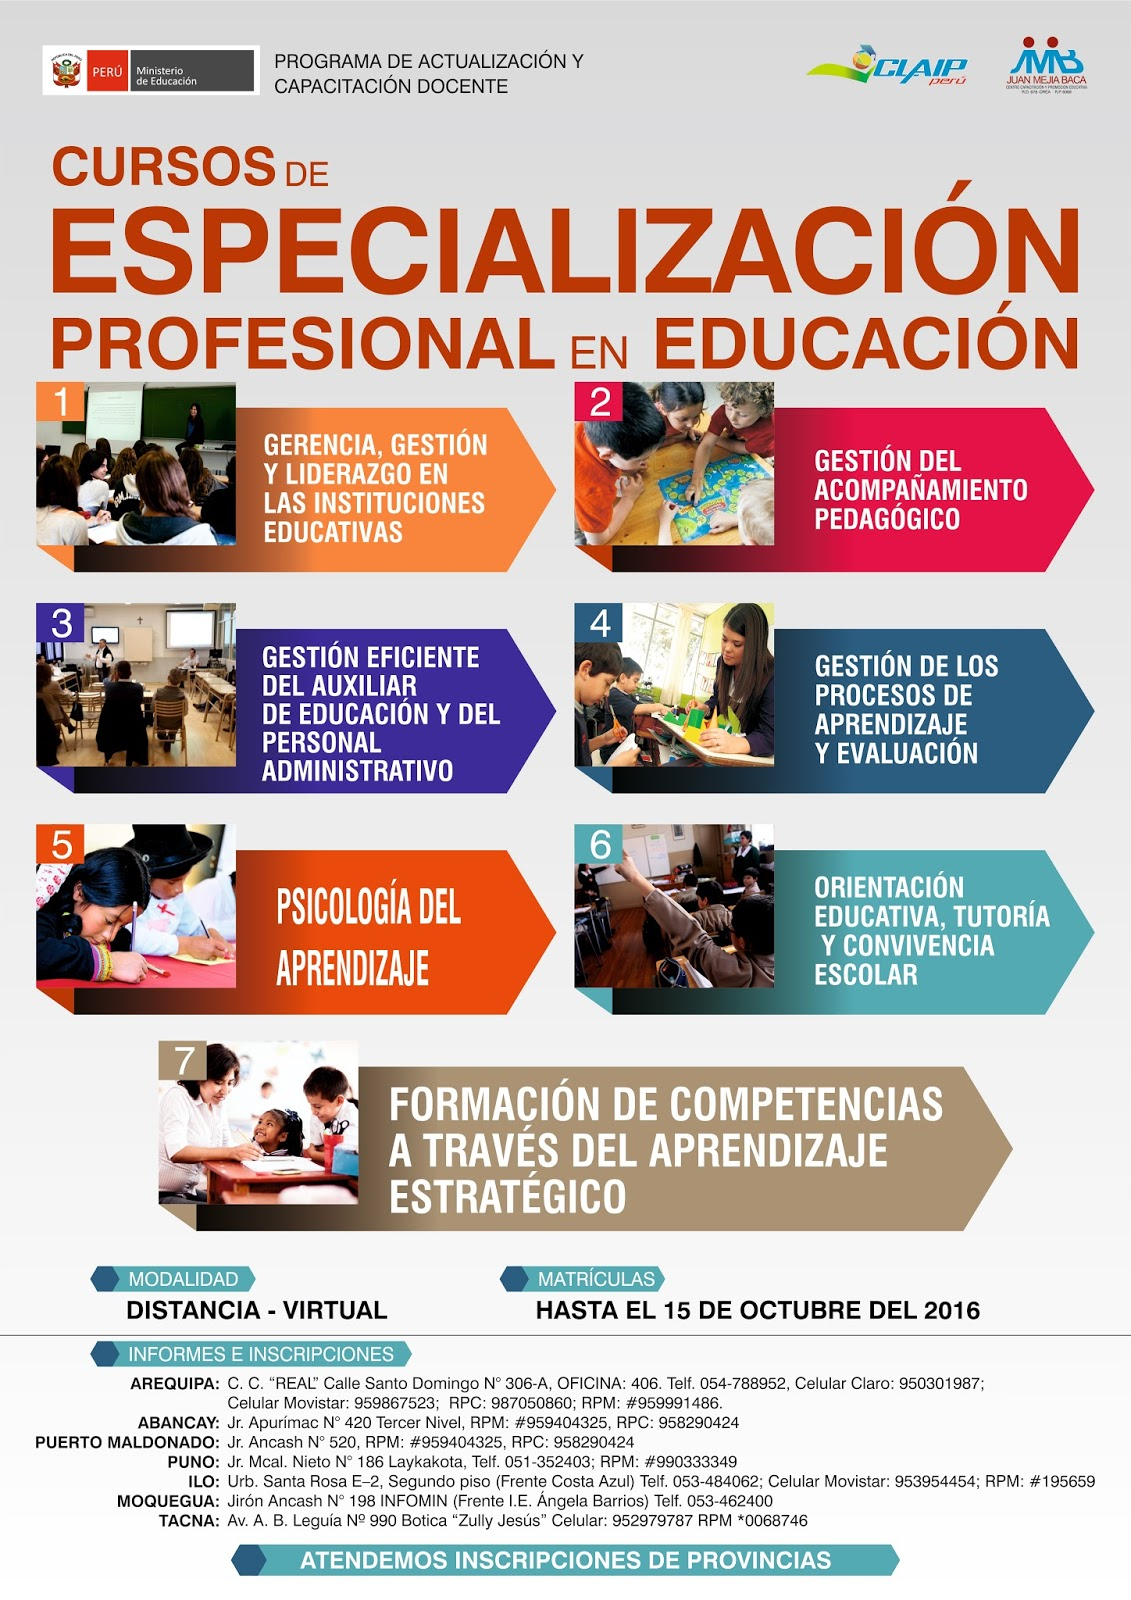 Diplomados para los docentes de arequipa noticias m s for Curso concurso docente 2016